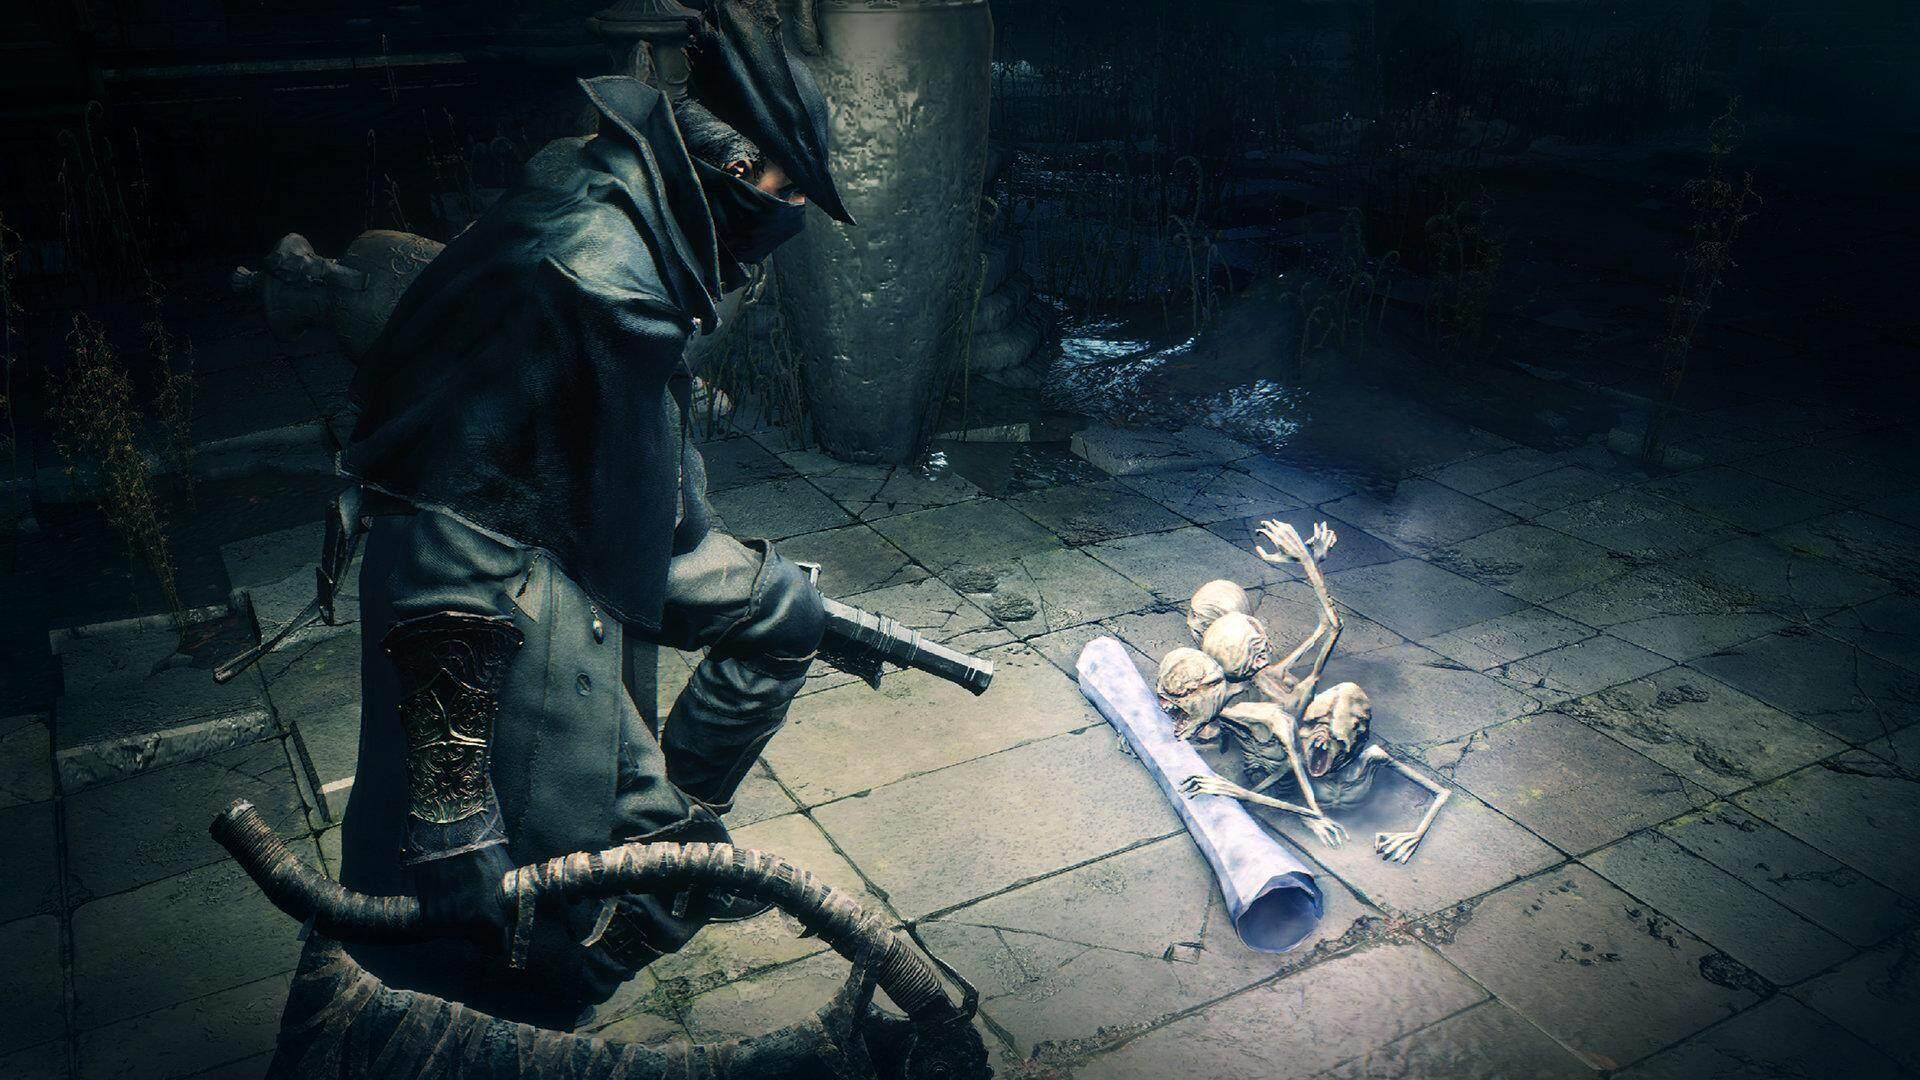 (PS4) Bloodborne (R3/ENG/CHN)